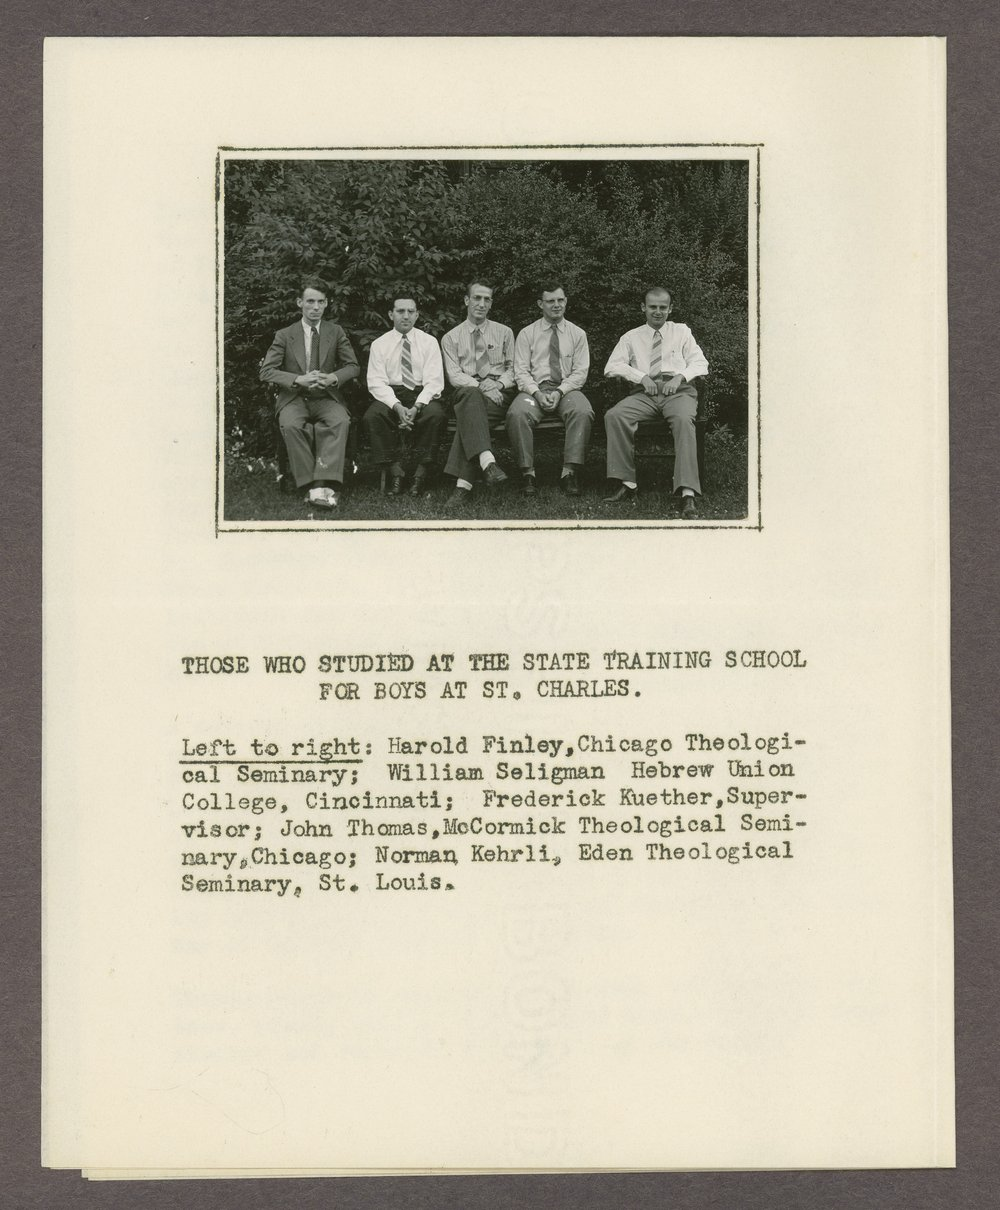 Anton T. Boisen papers - 2